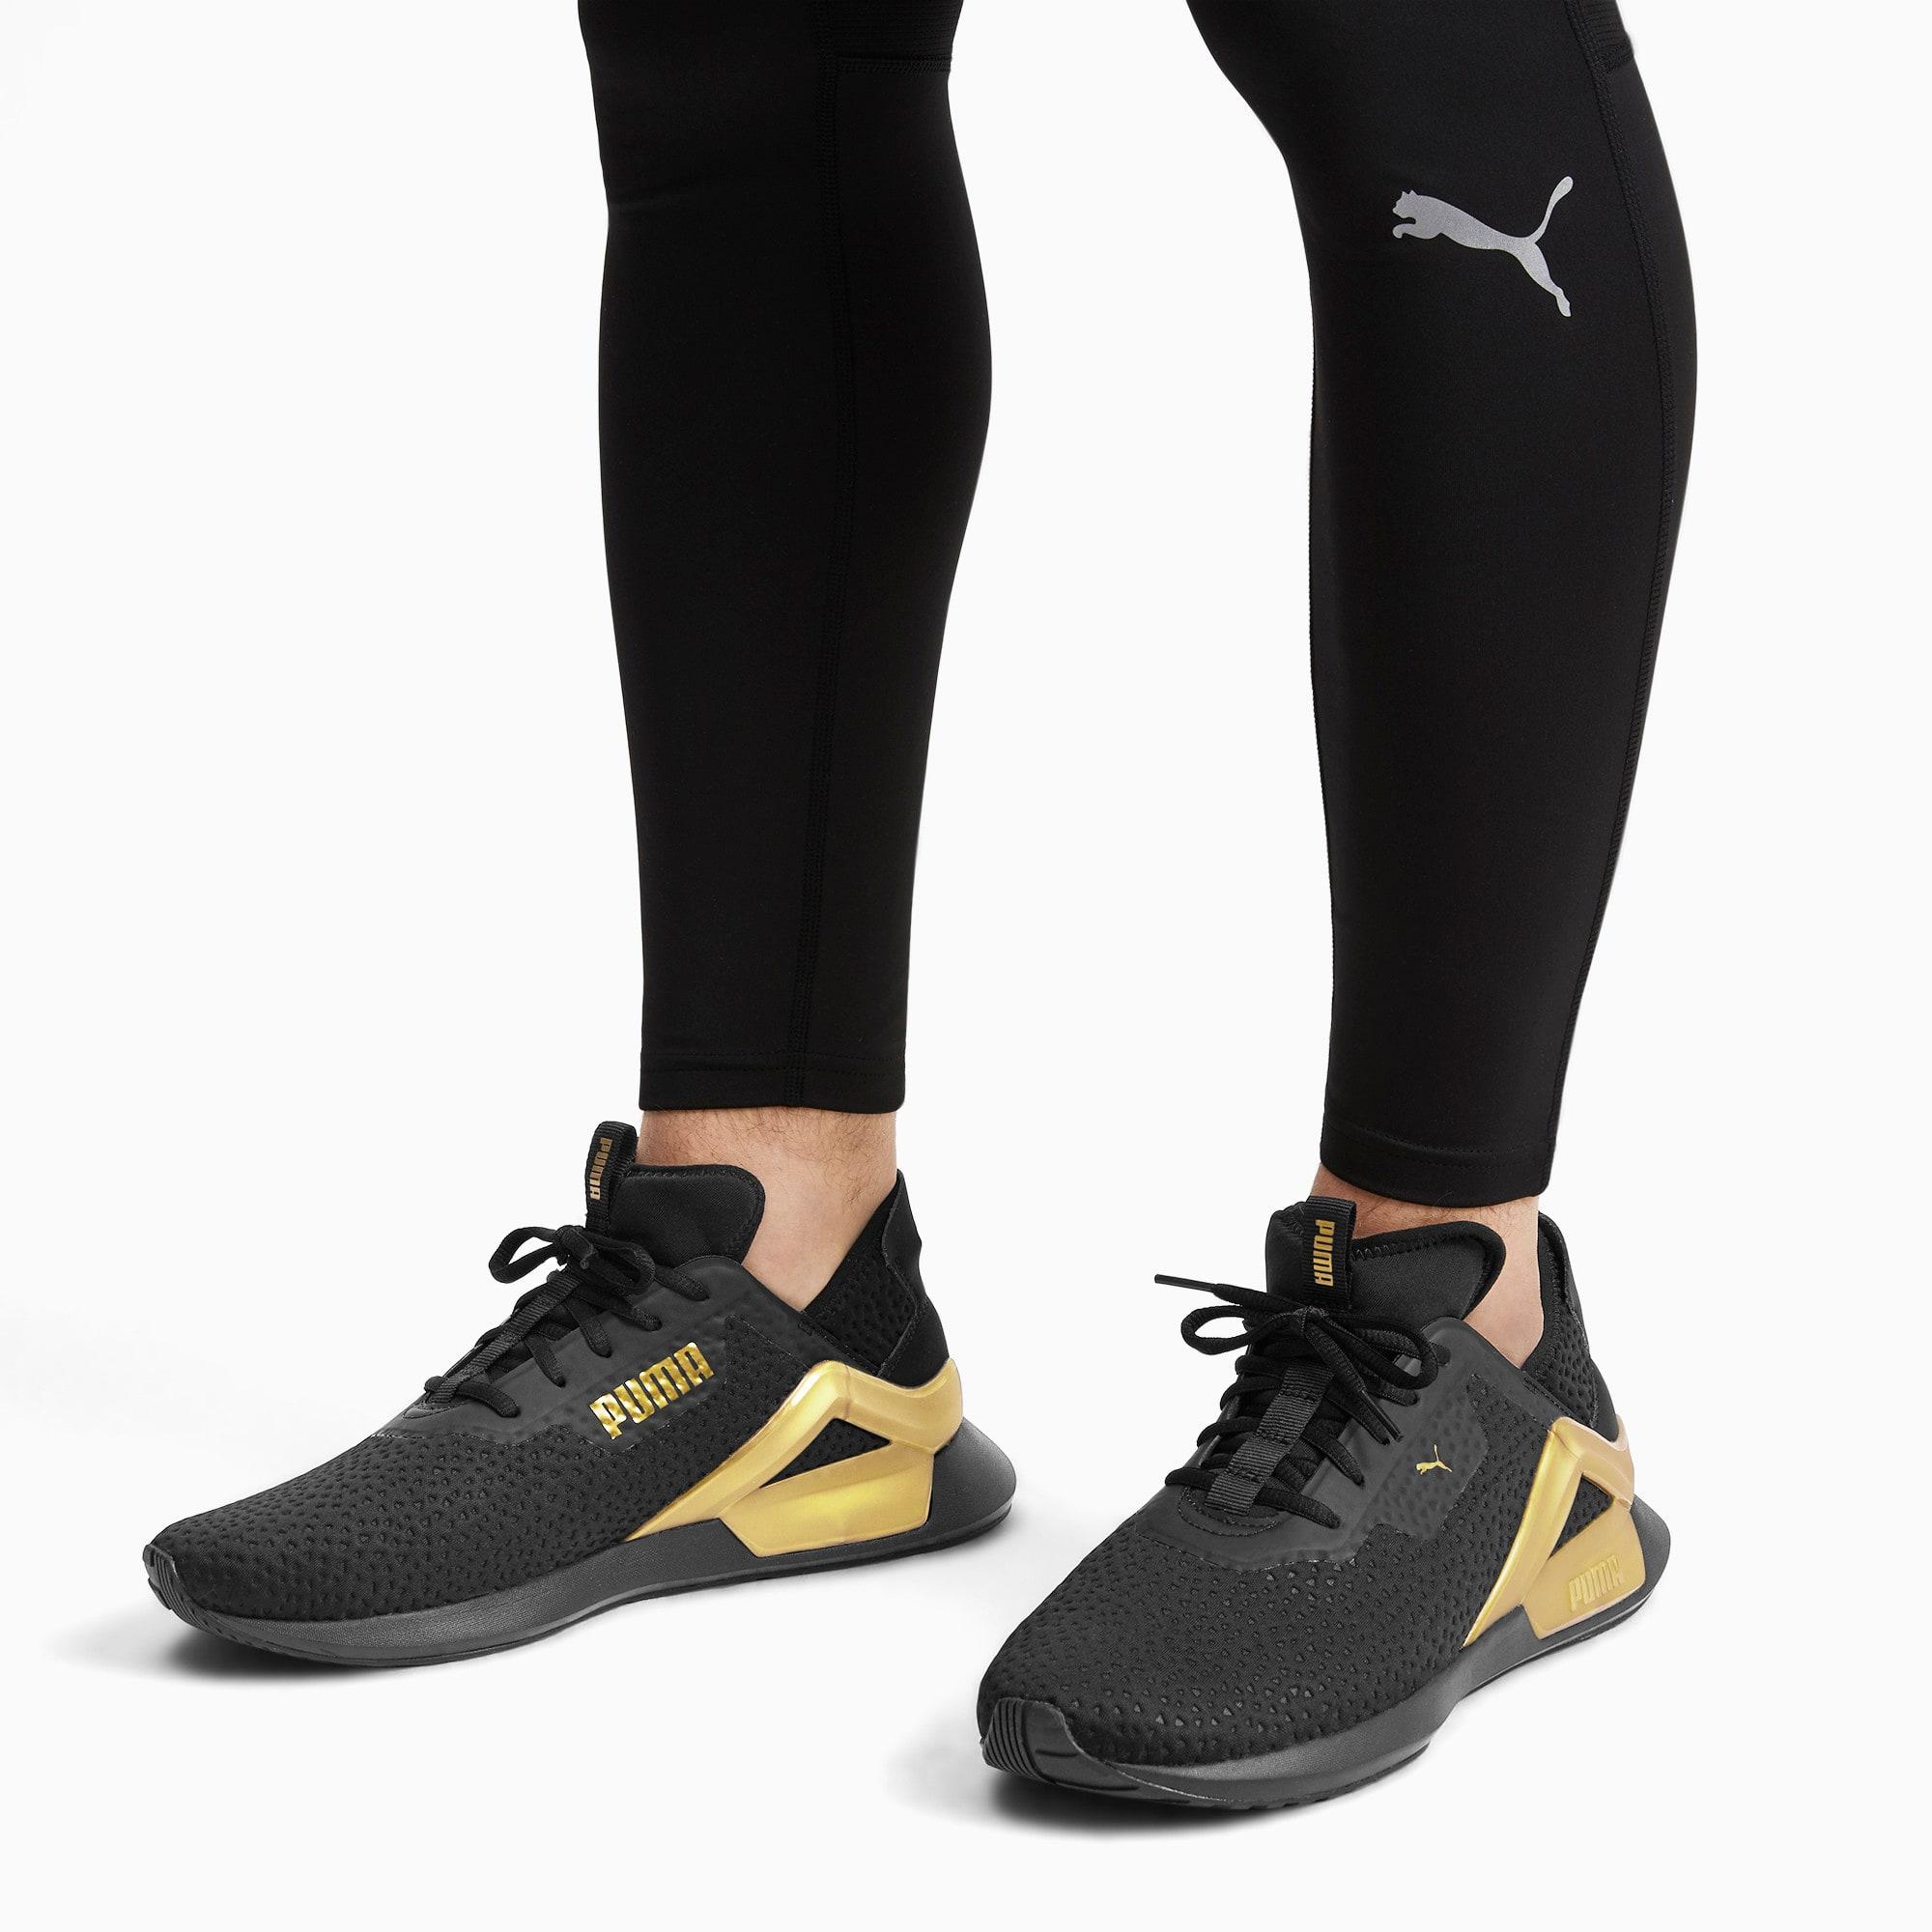 Thumbnail 2 of Rogue X Metallic Herren Sneaker, Puma Black-Gold, medium